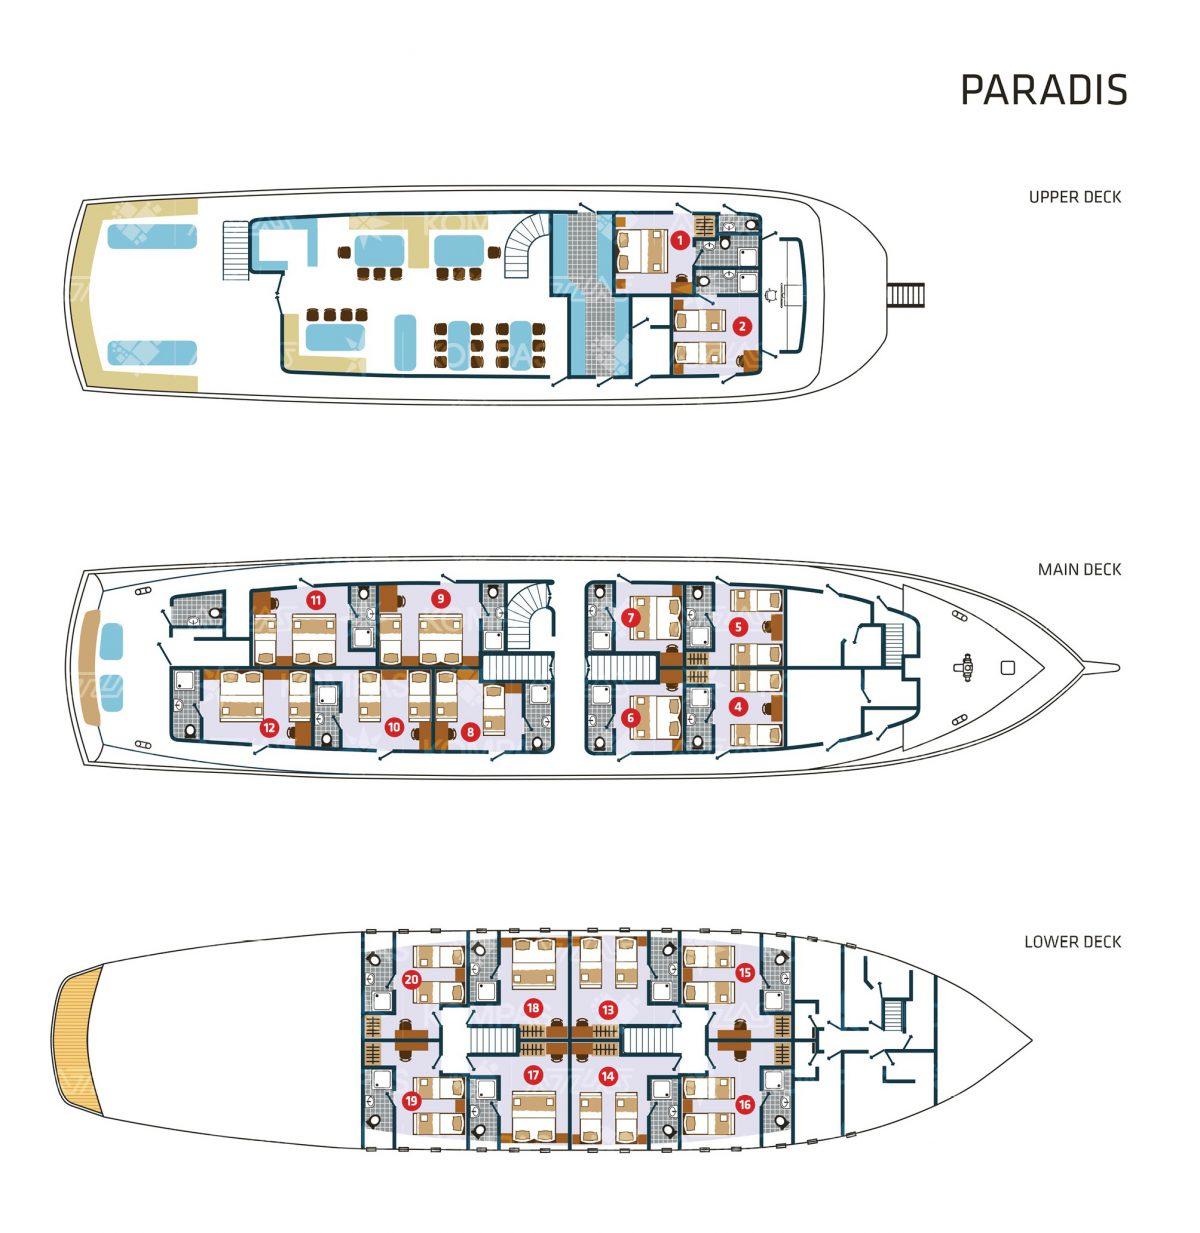 Paradis Deck Plan